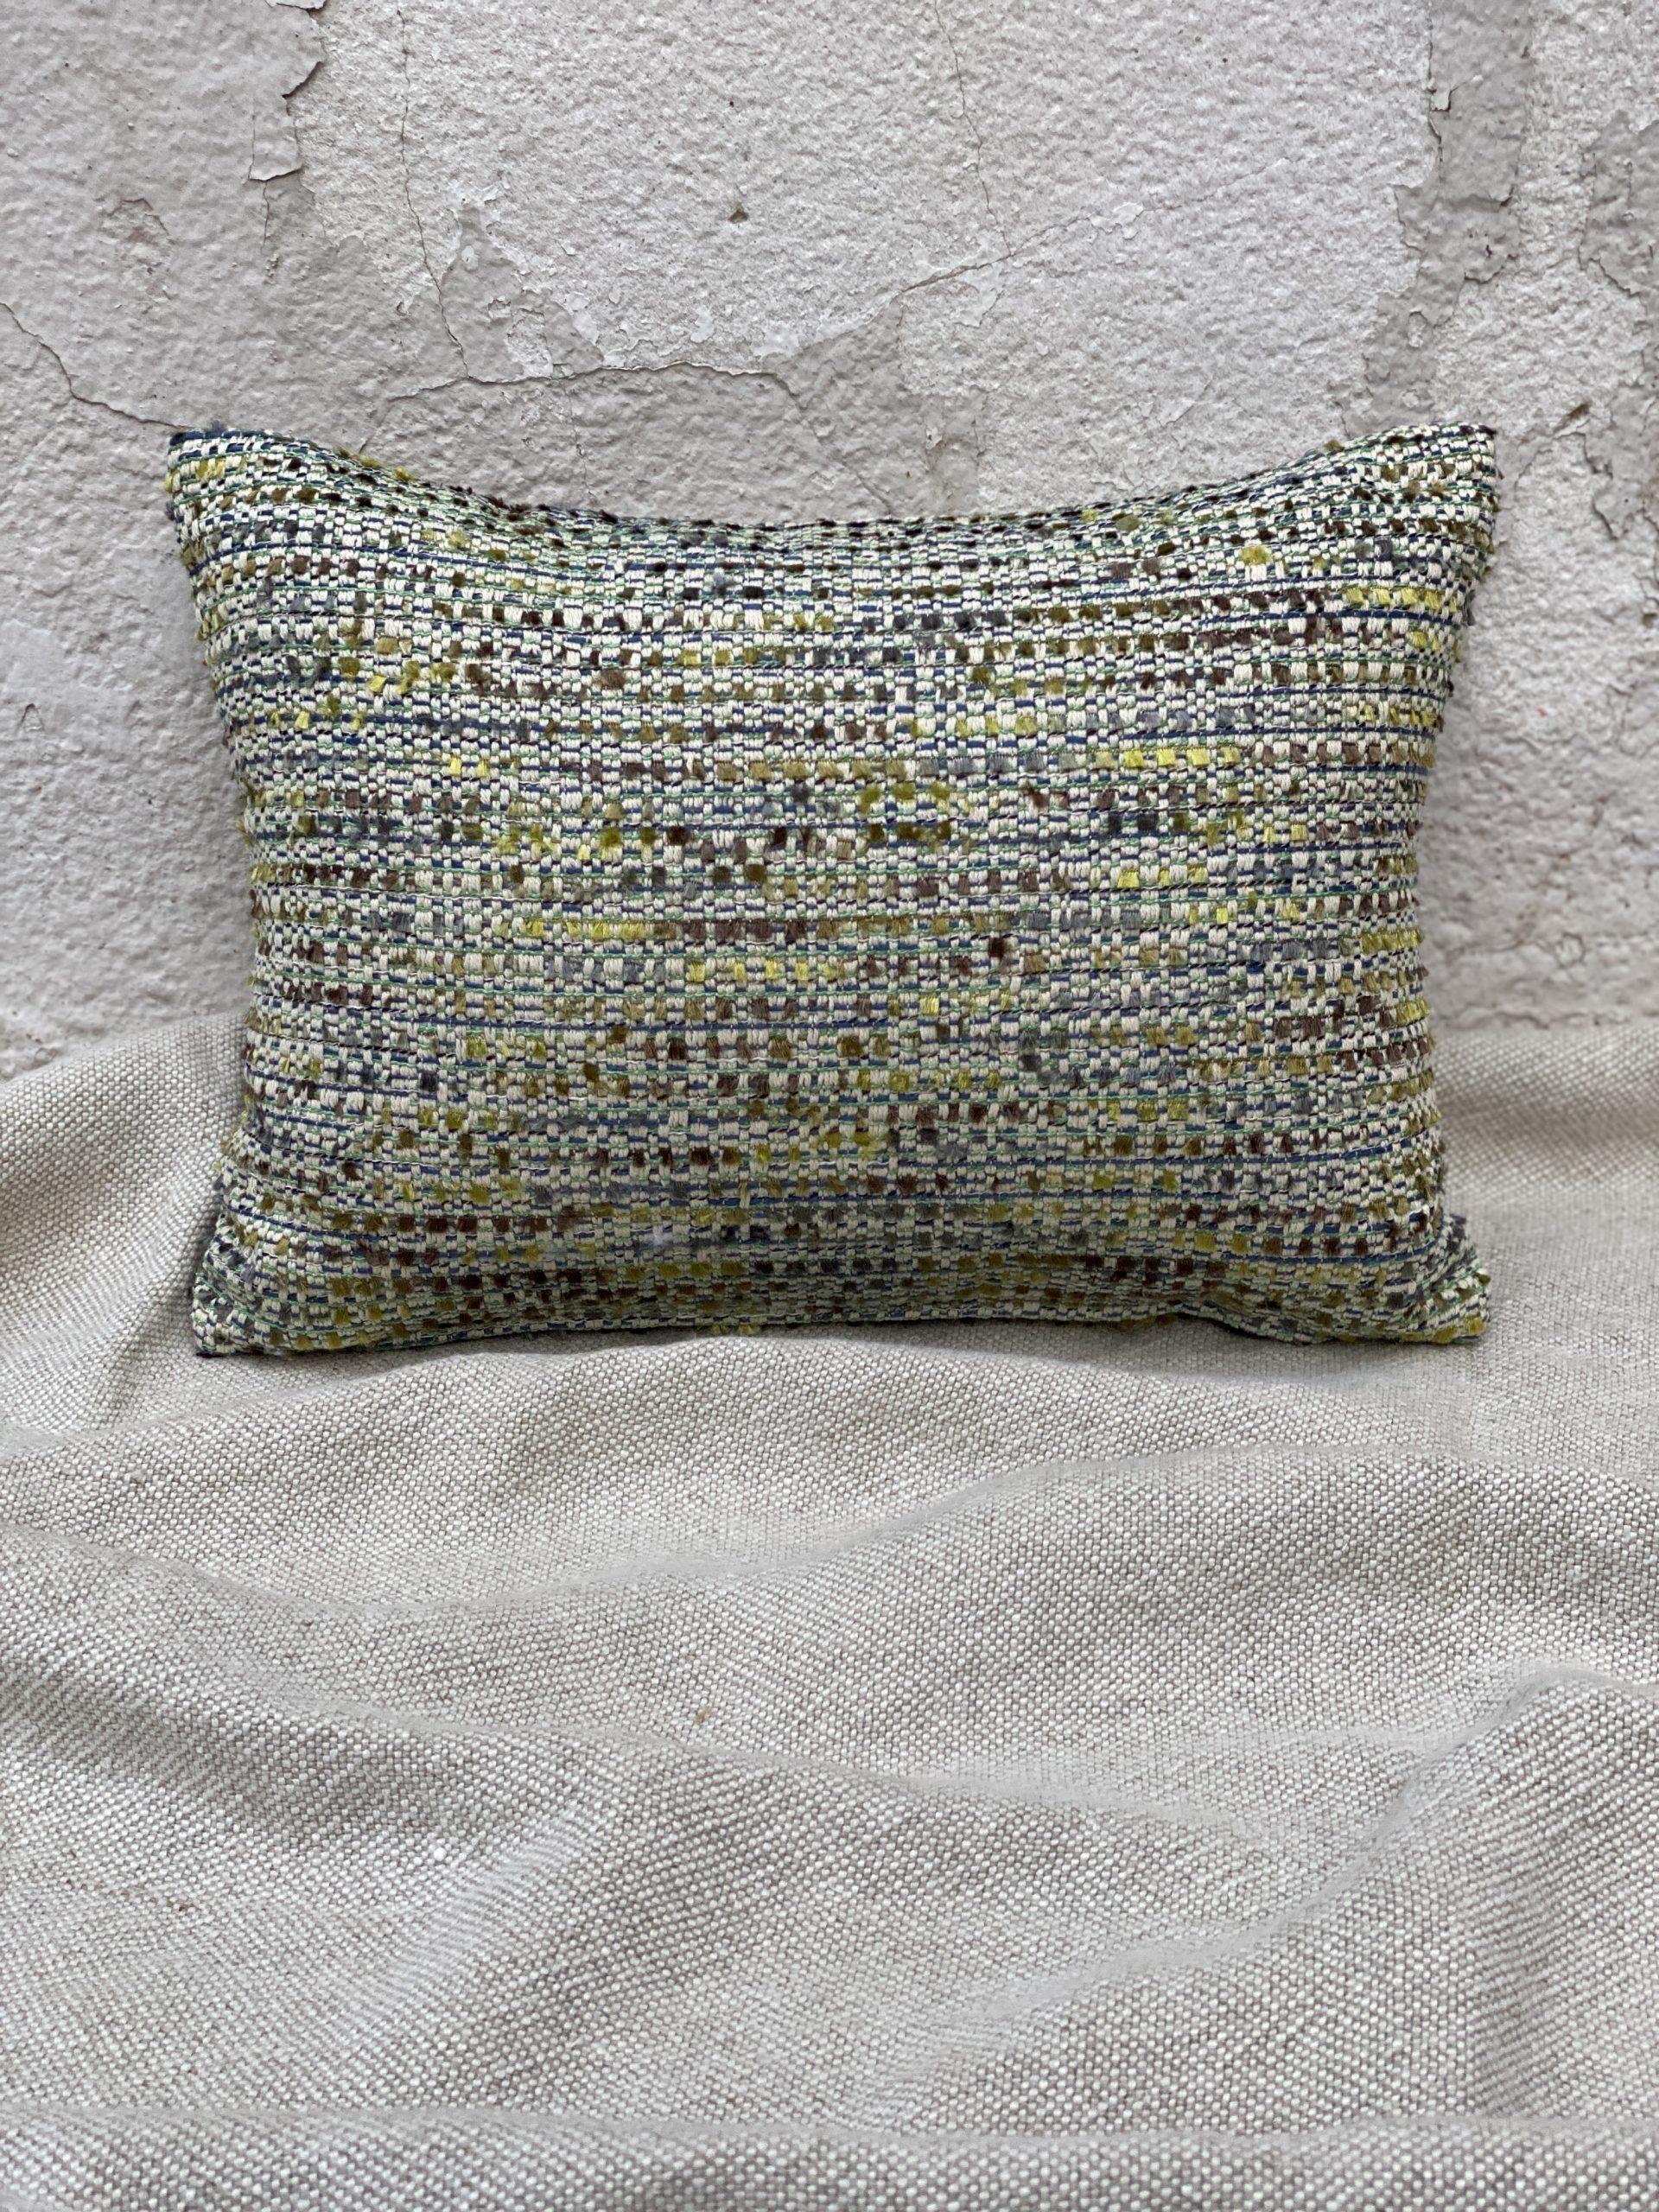 Architex Pillow